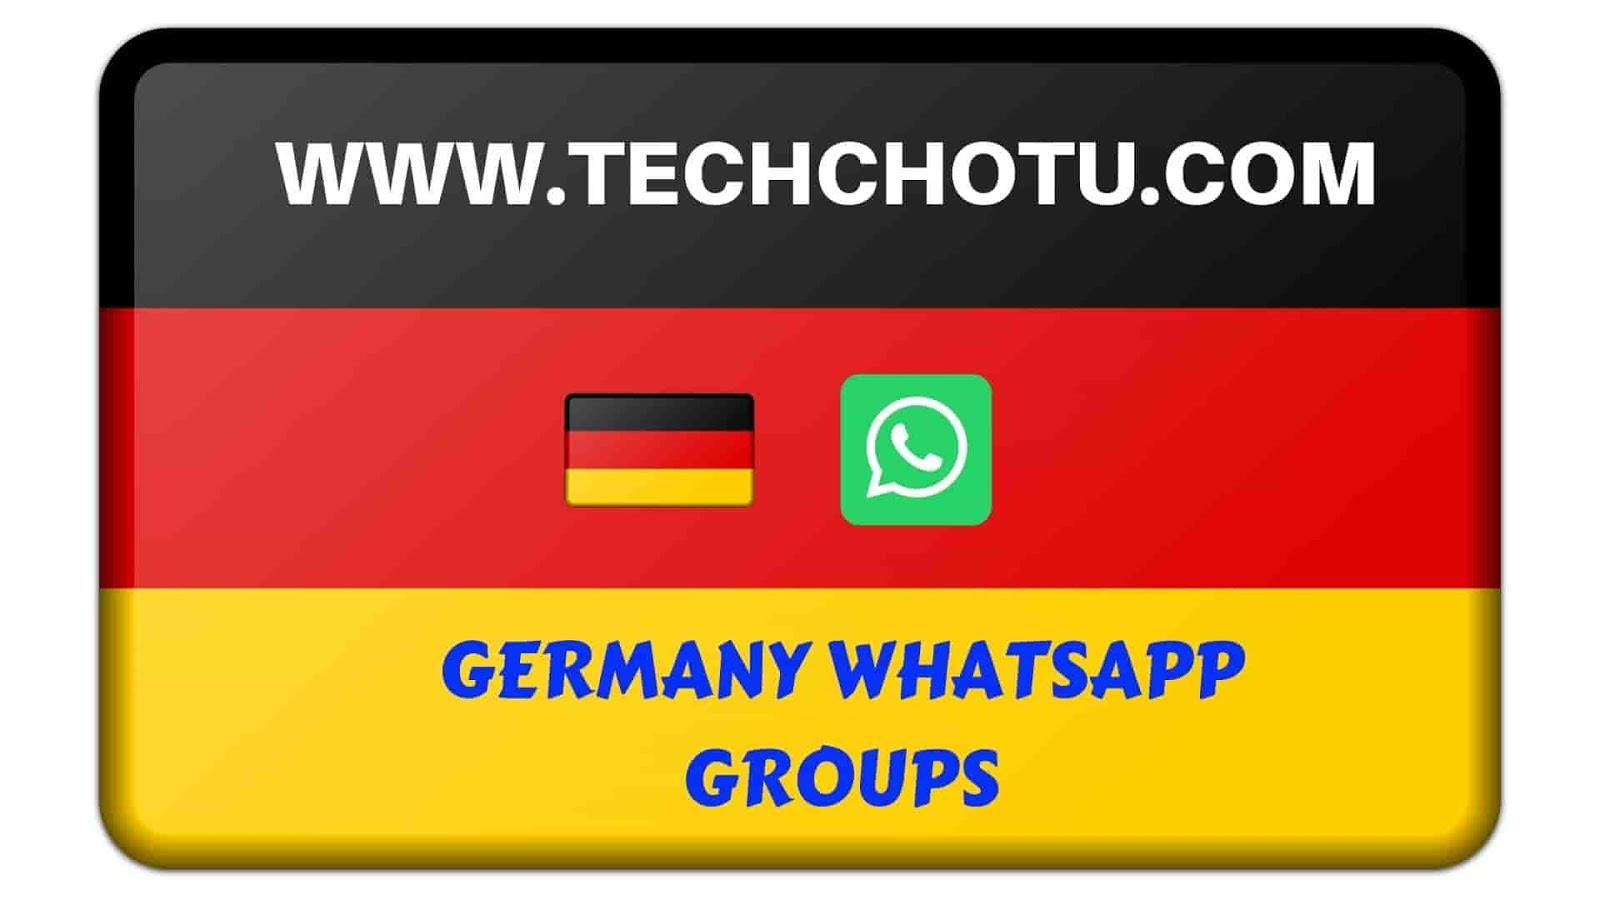 GERMANY WHATSAPP GROUP LINKS - TECHCHOTU 2019